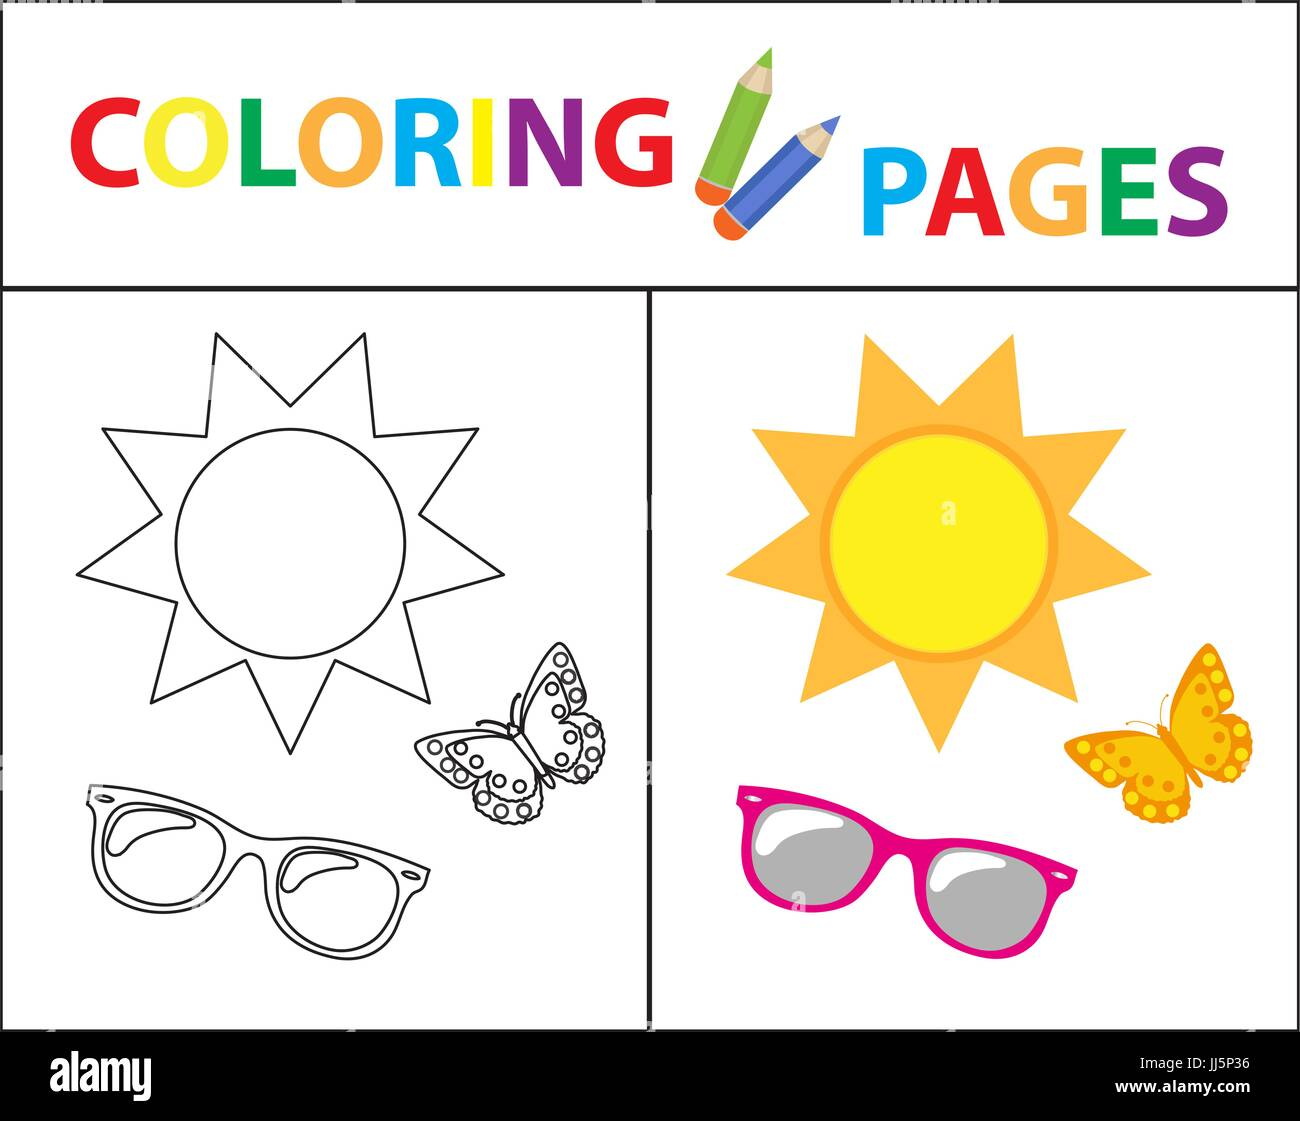 Coloring Book Seite. Sommer-set, Gläser, Sonne, Schmetterling ...